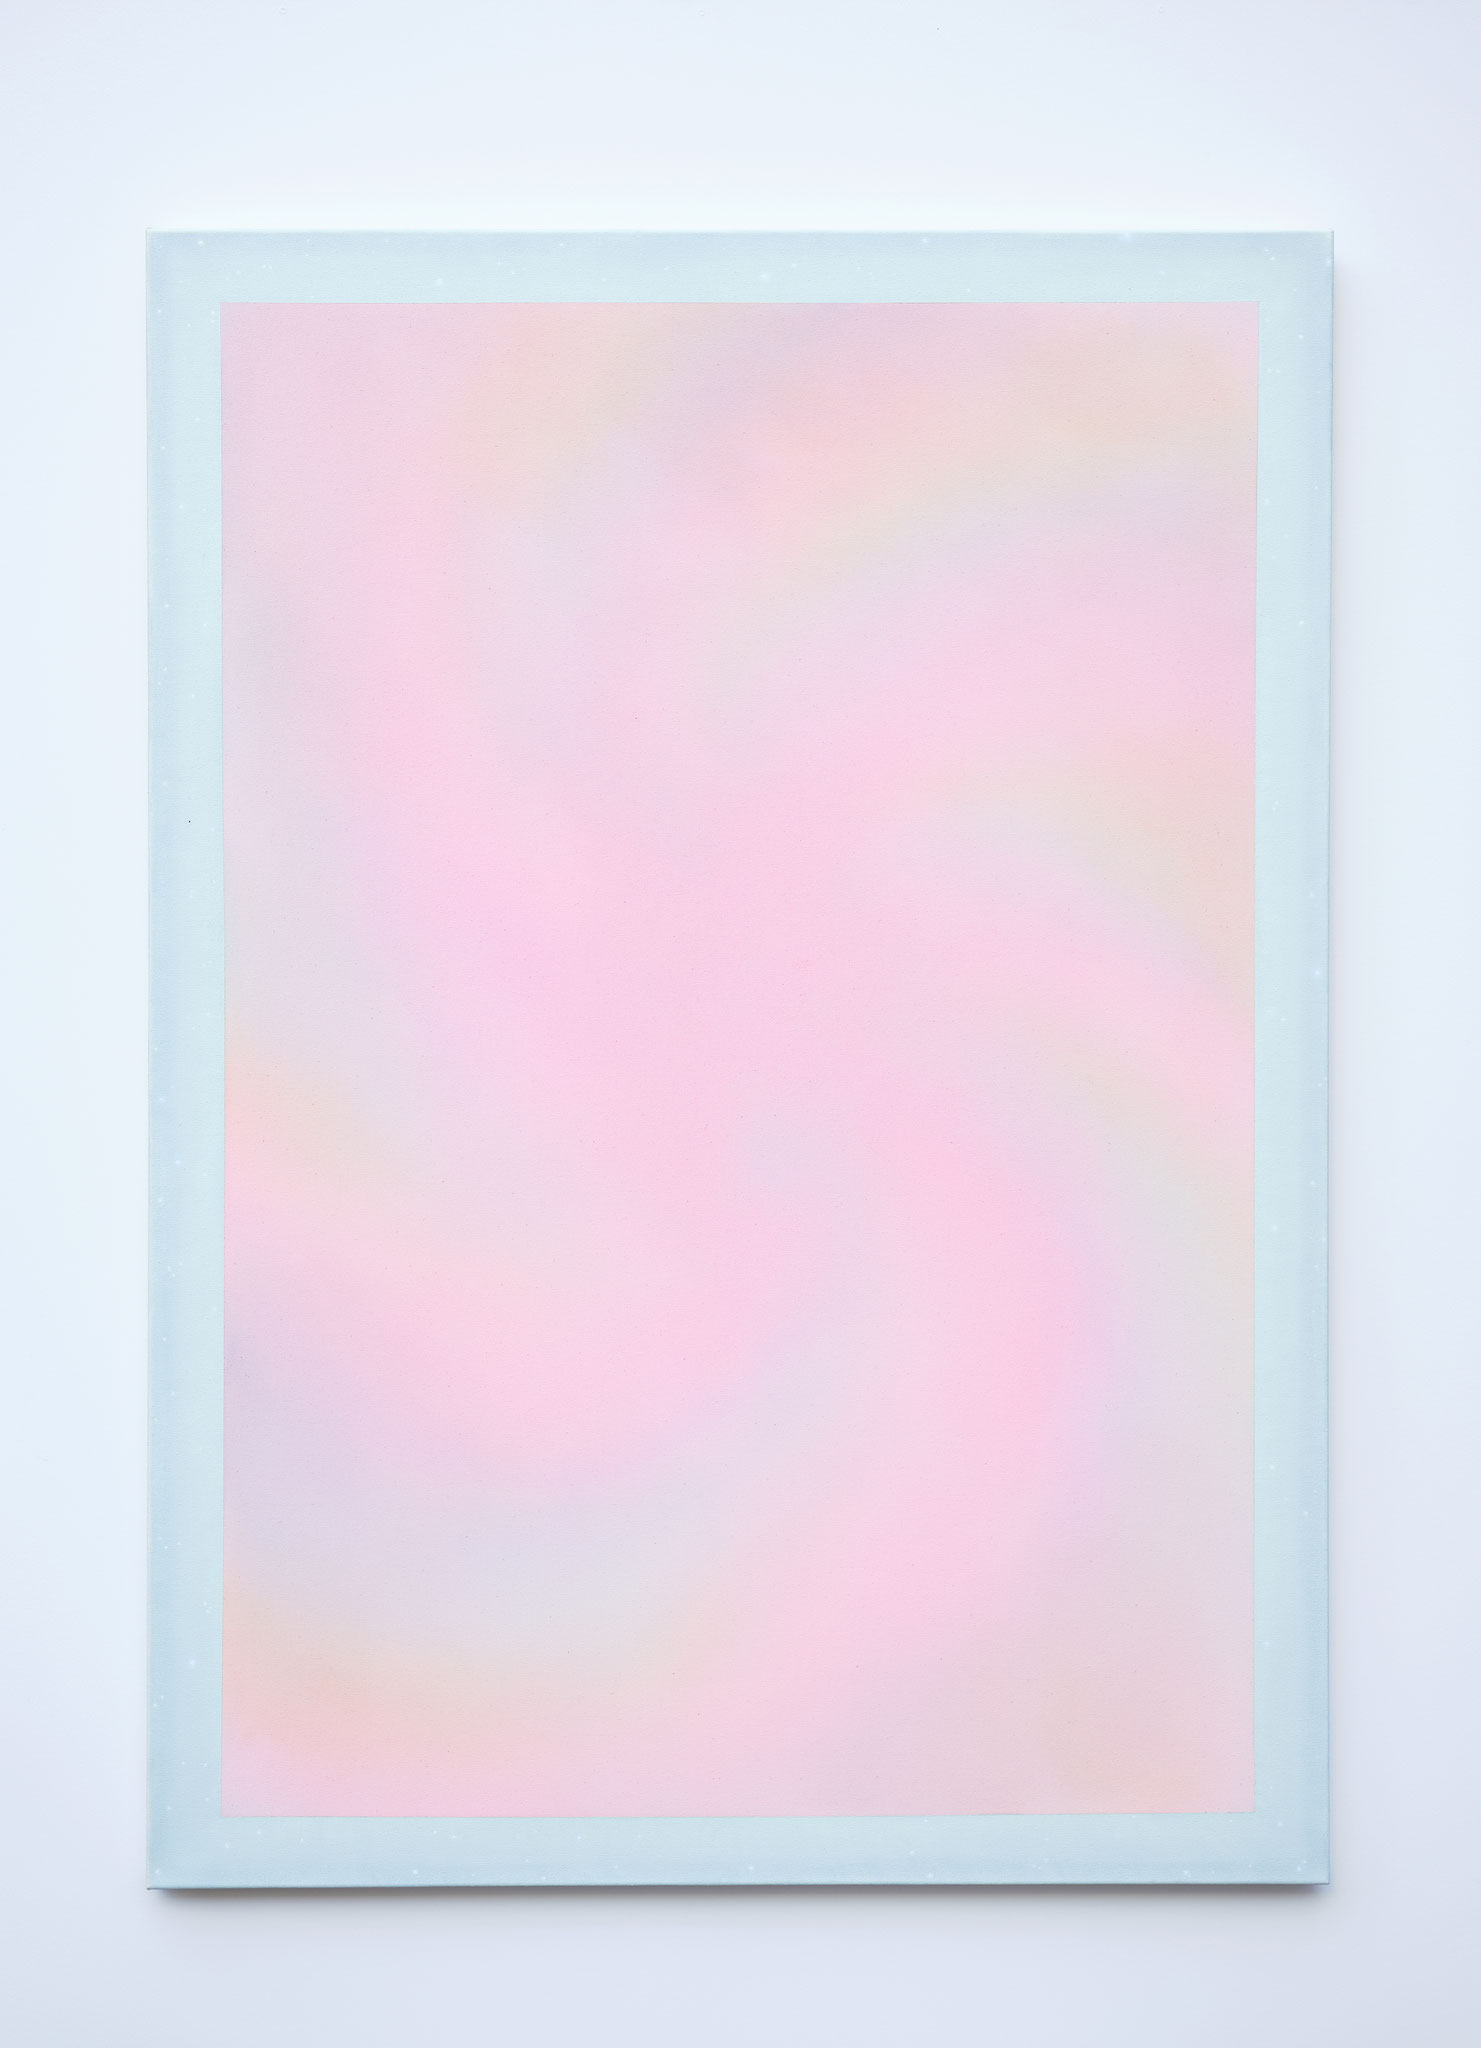 "Alina Birkner ""Untitled (Silver Crystal Power)"" 2018, 170x120 cm, Acrylic on Canvas"